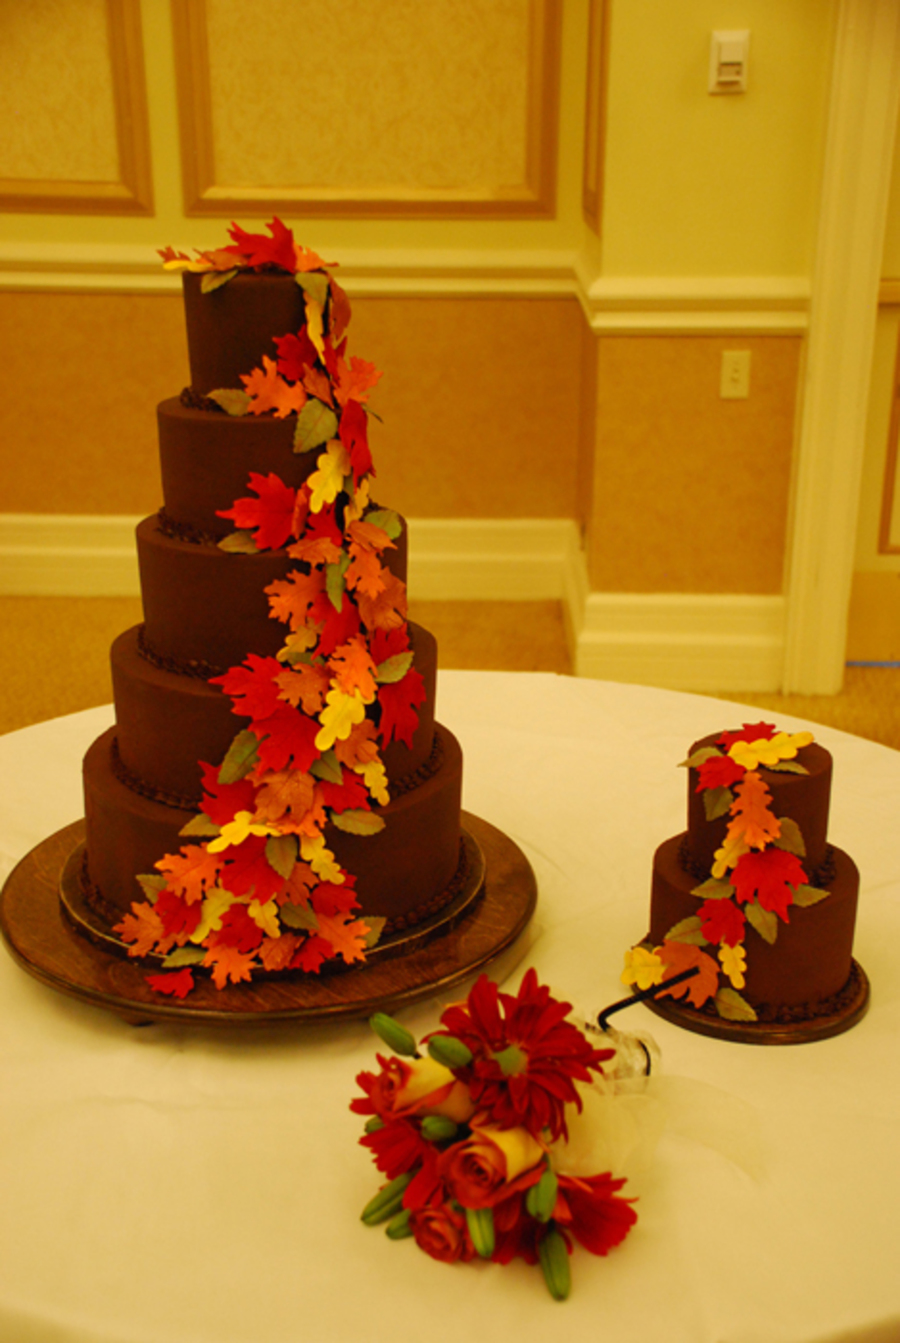 Ganache 5 Tier Fall Leaves Wedding Cake - CakeCentral.com